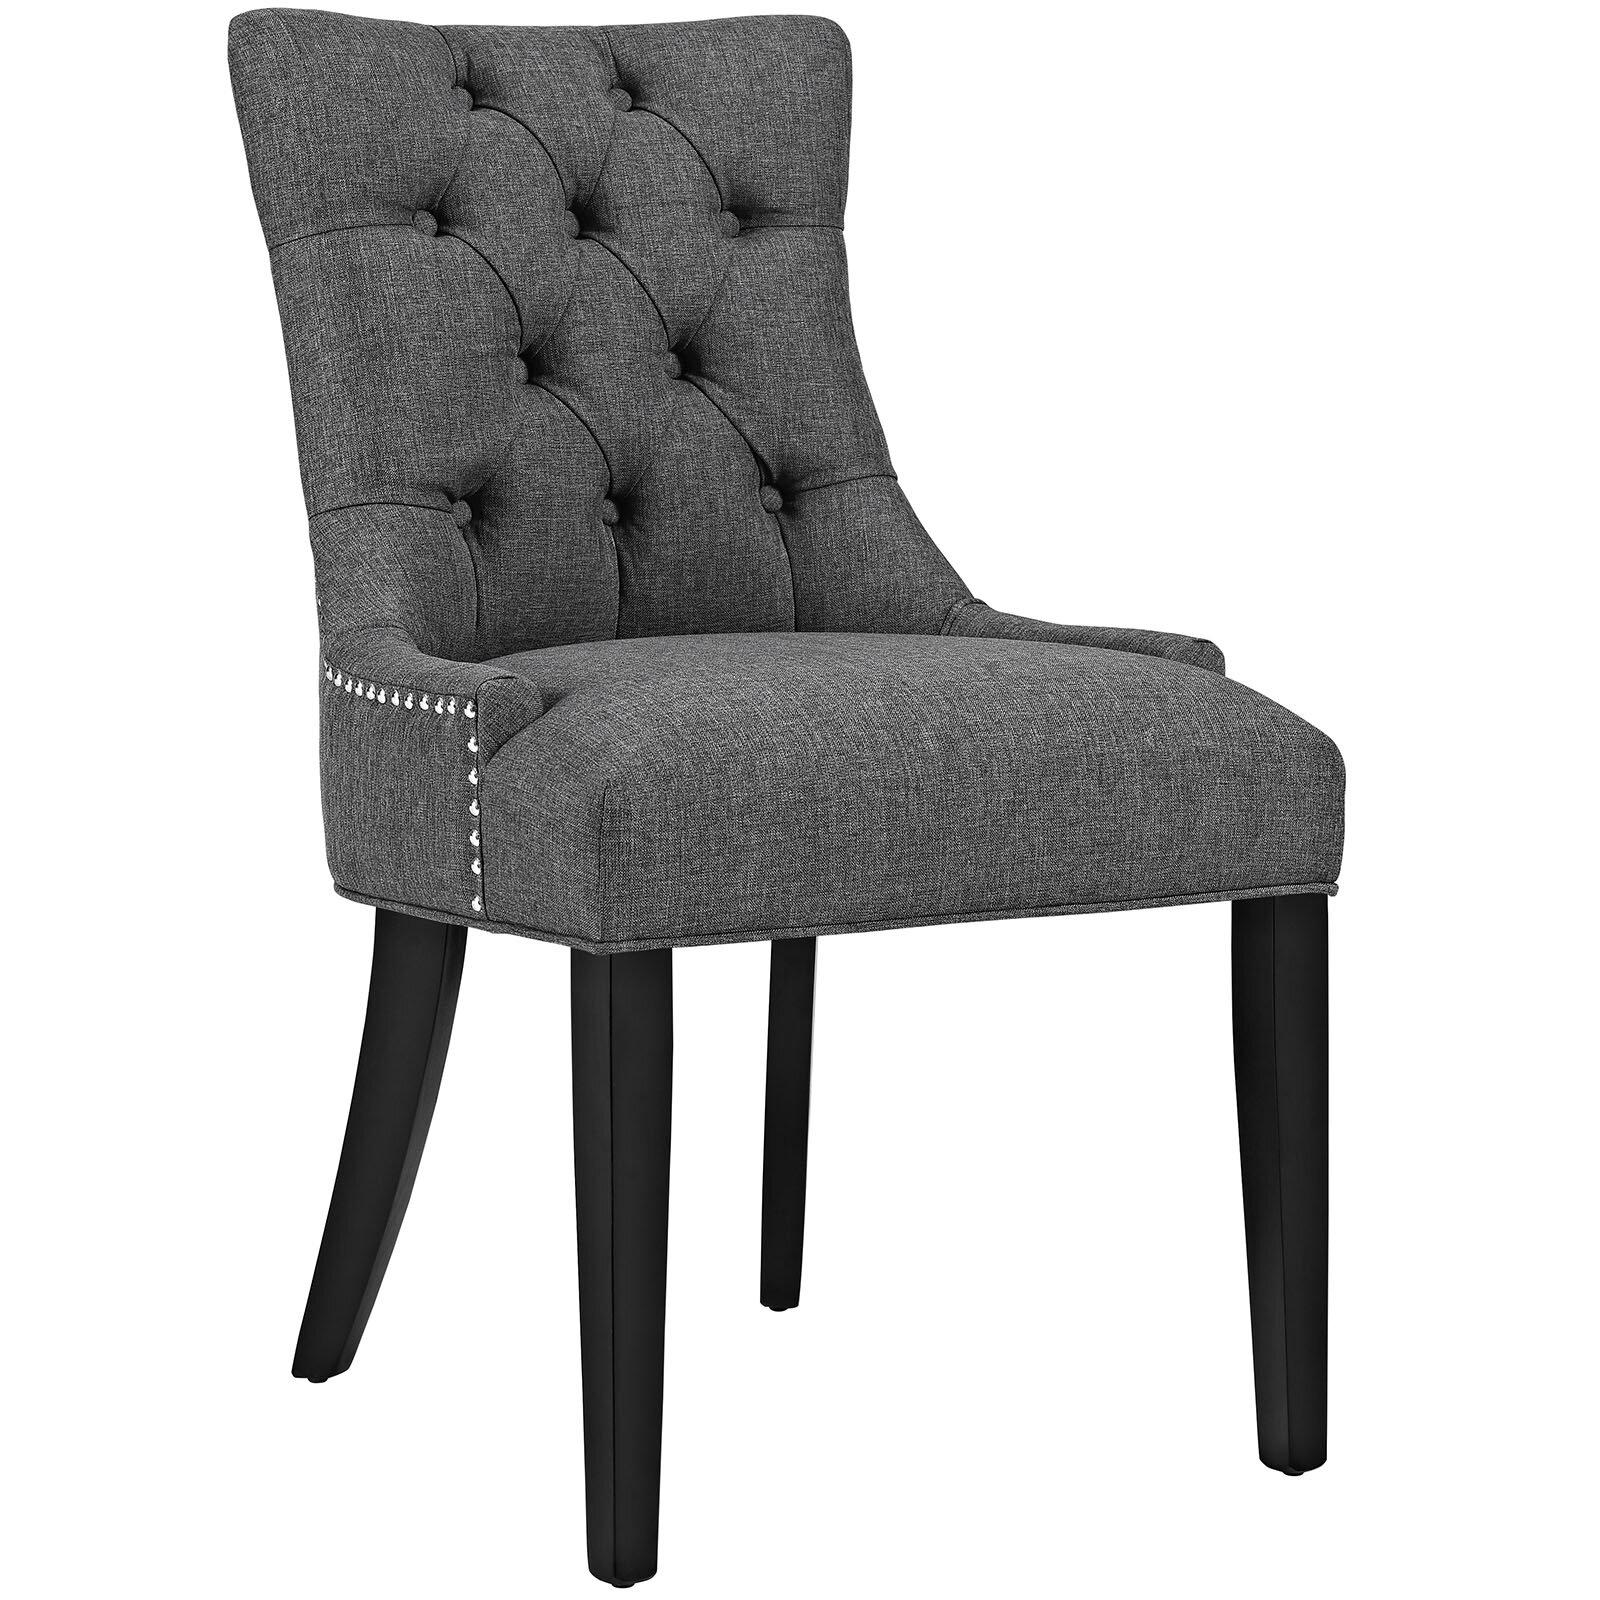 Red Barrel Studio Apoloniusz Tufted Side Chair Reviews Wayfair